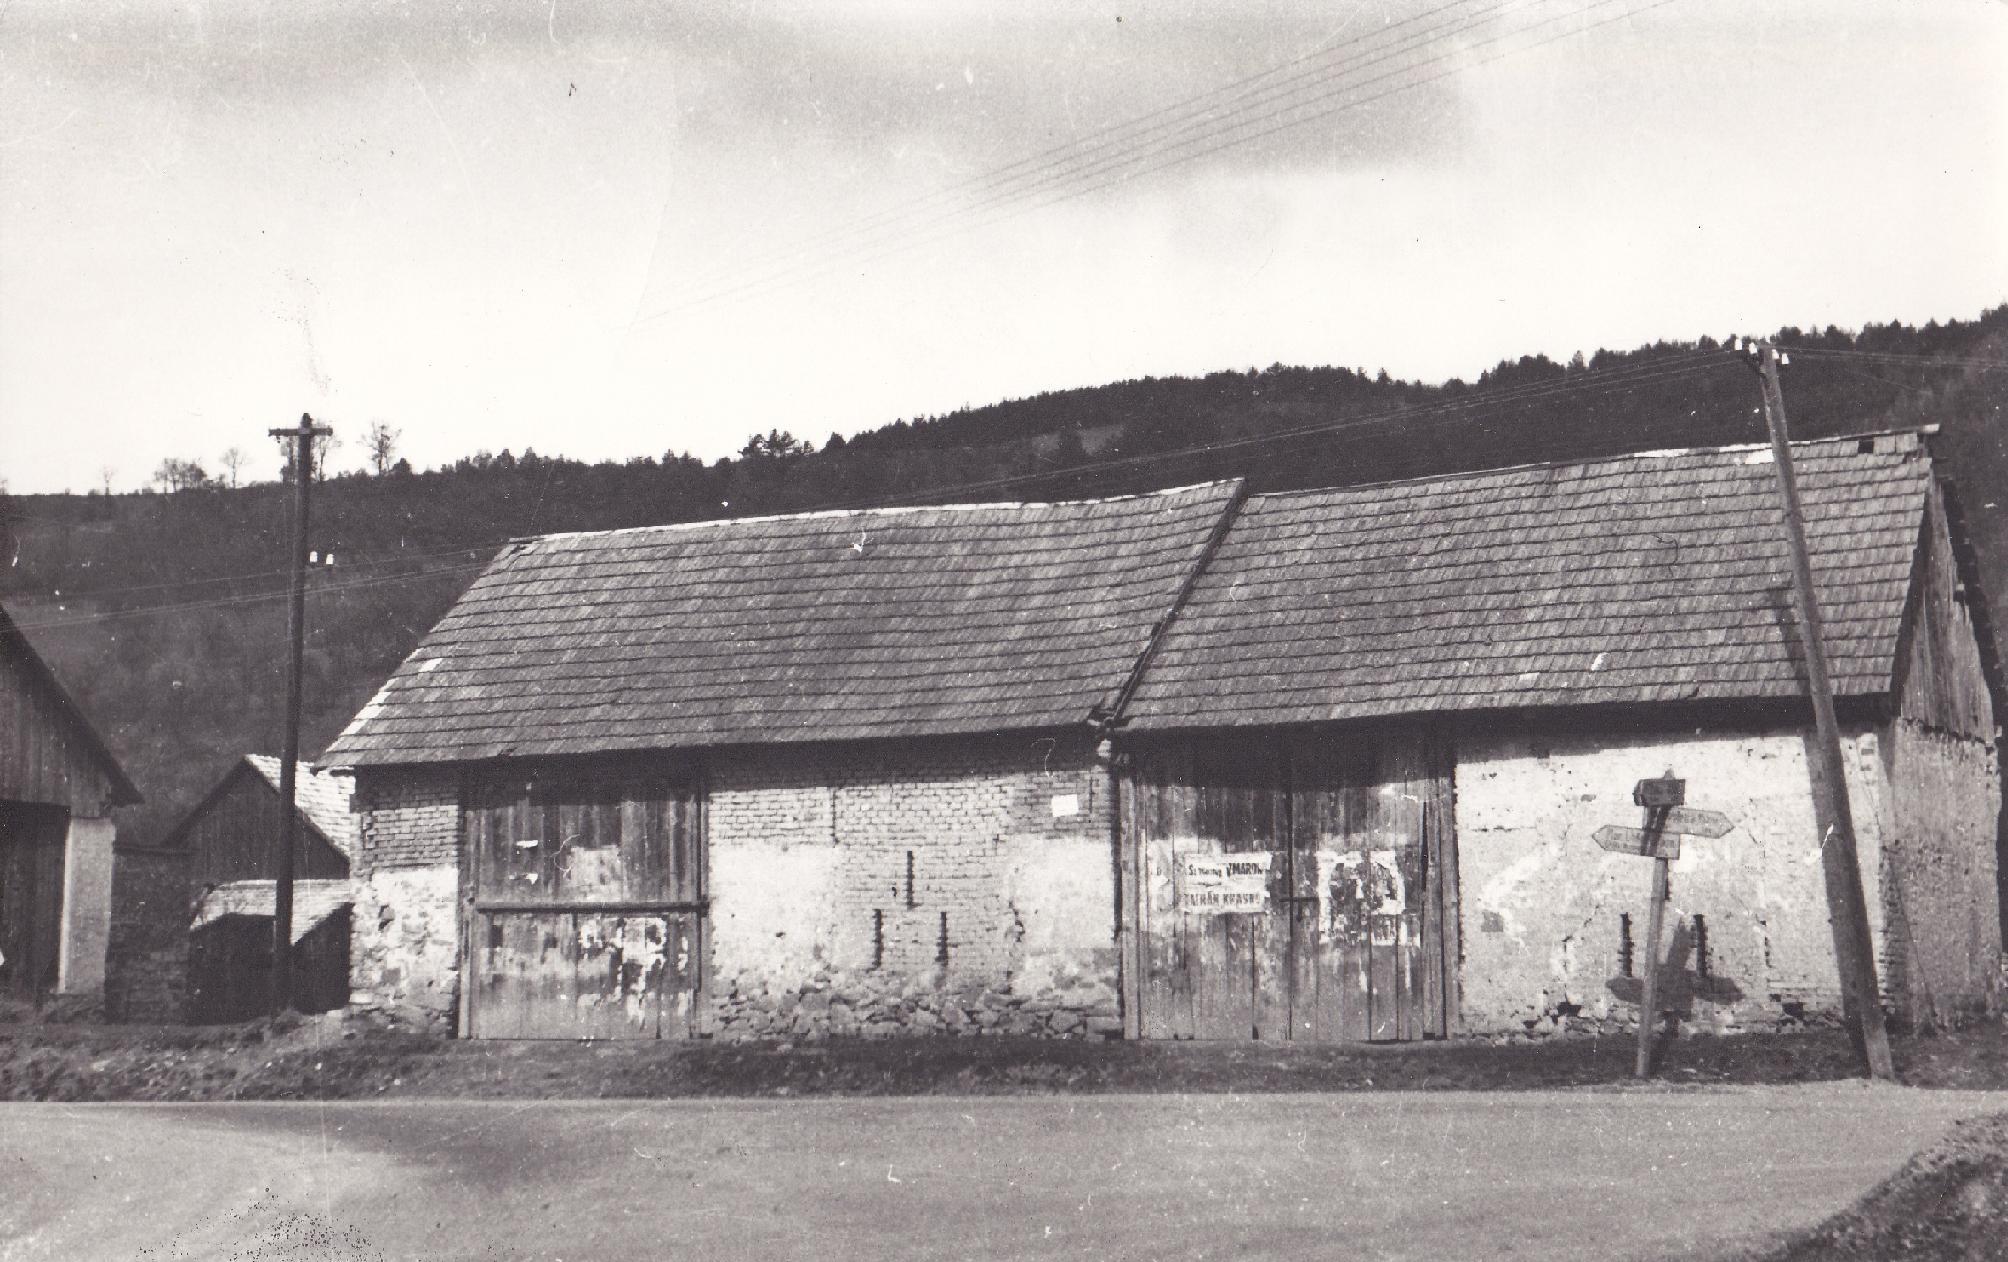 Križovatka Štefánikovej a Komenského ulice v pol. 20. storočia (dnes ZŠ Komenského) Smerovník ukazuje smer PB, ZA a Horní Lideč.